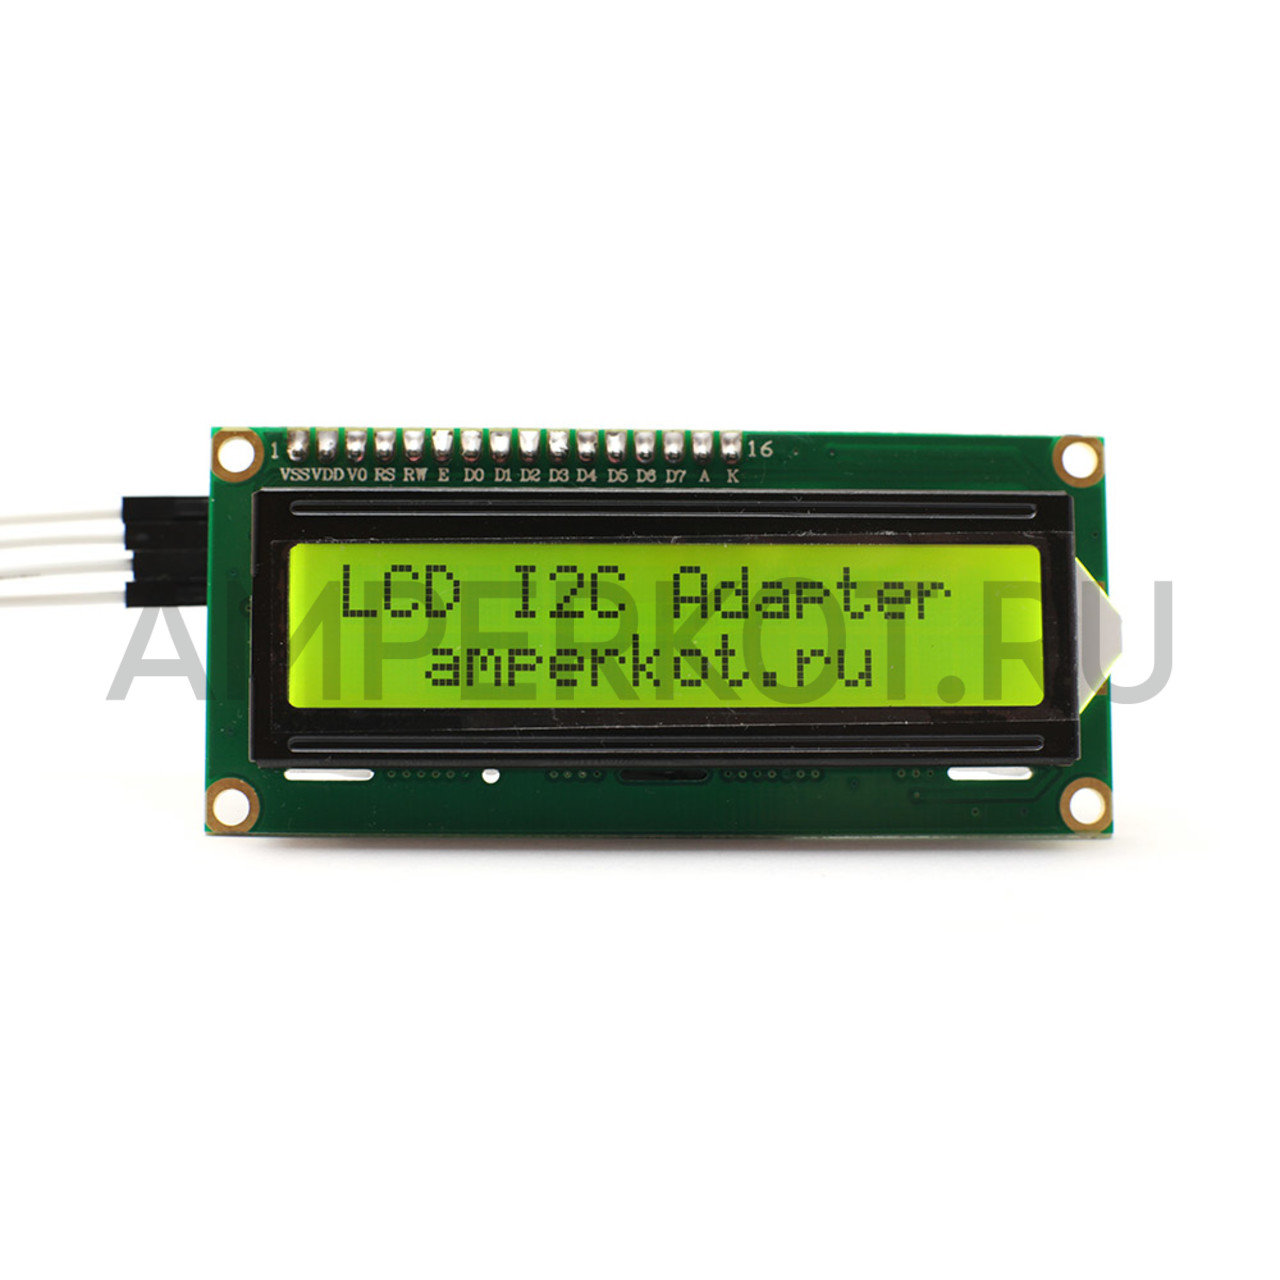 LCD дисплей HJ1602A 16x2 с I2C переходником, желтая подсветка